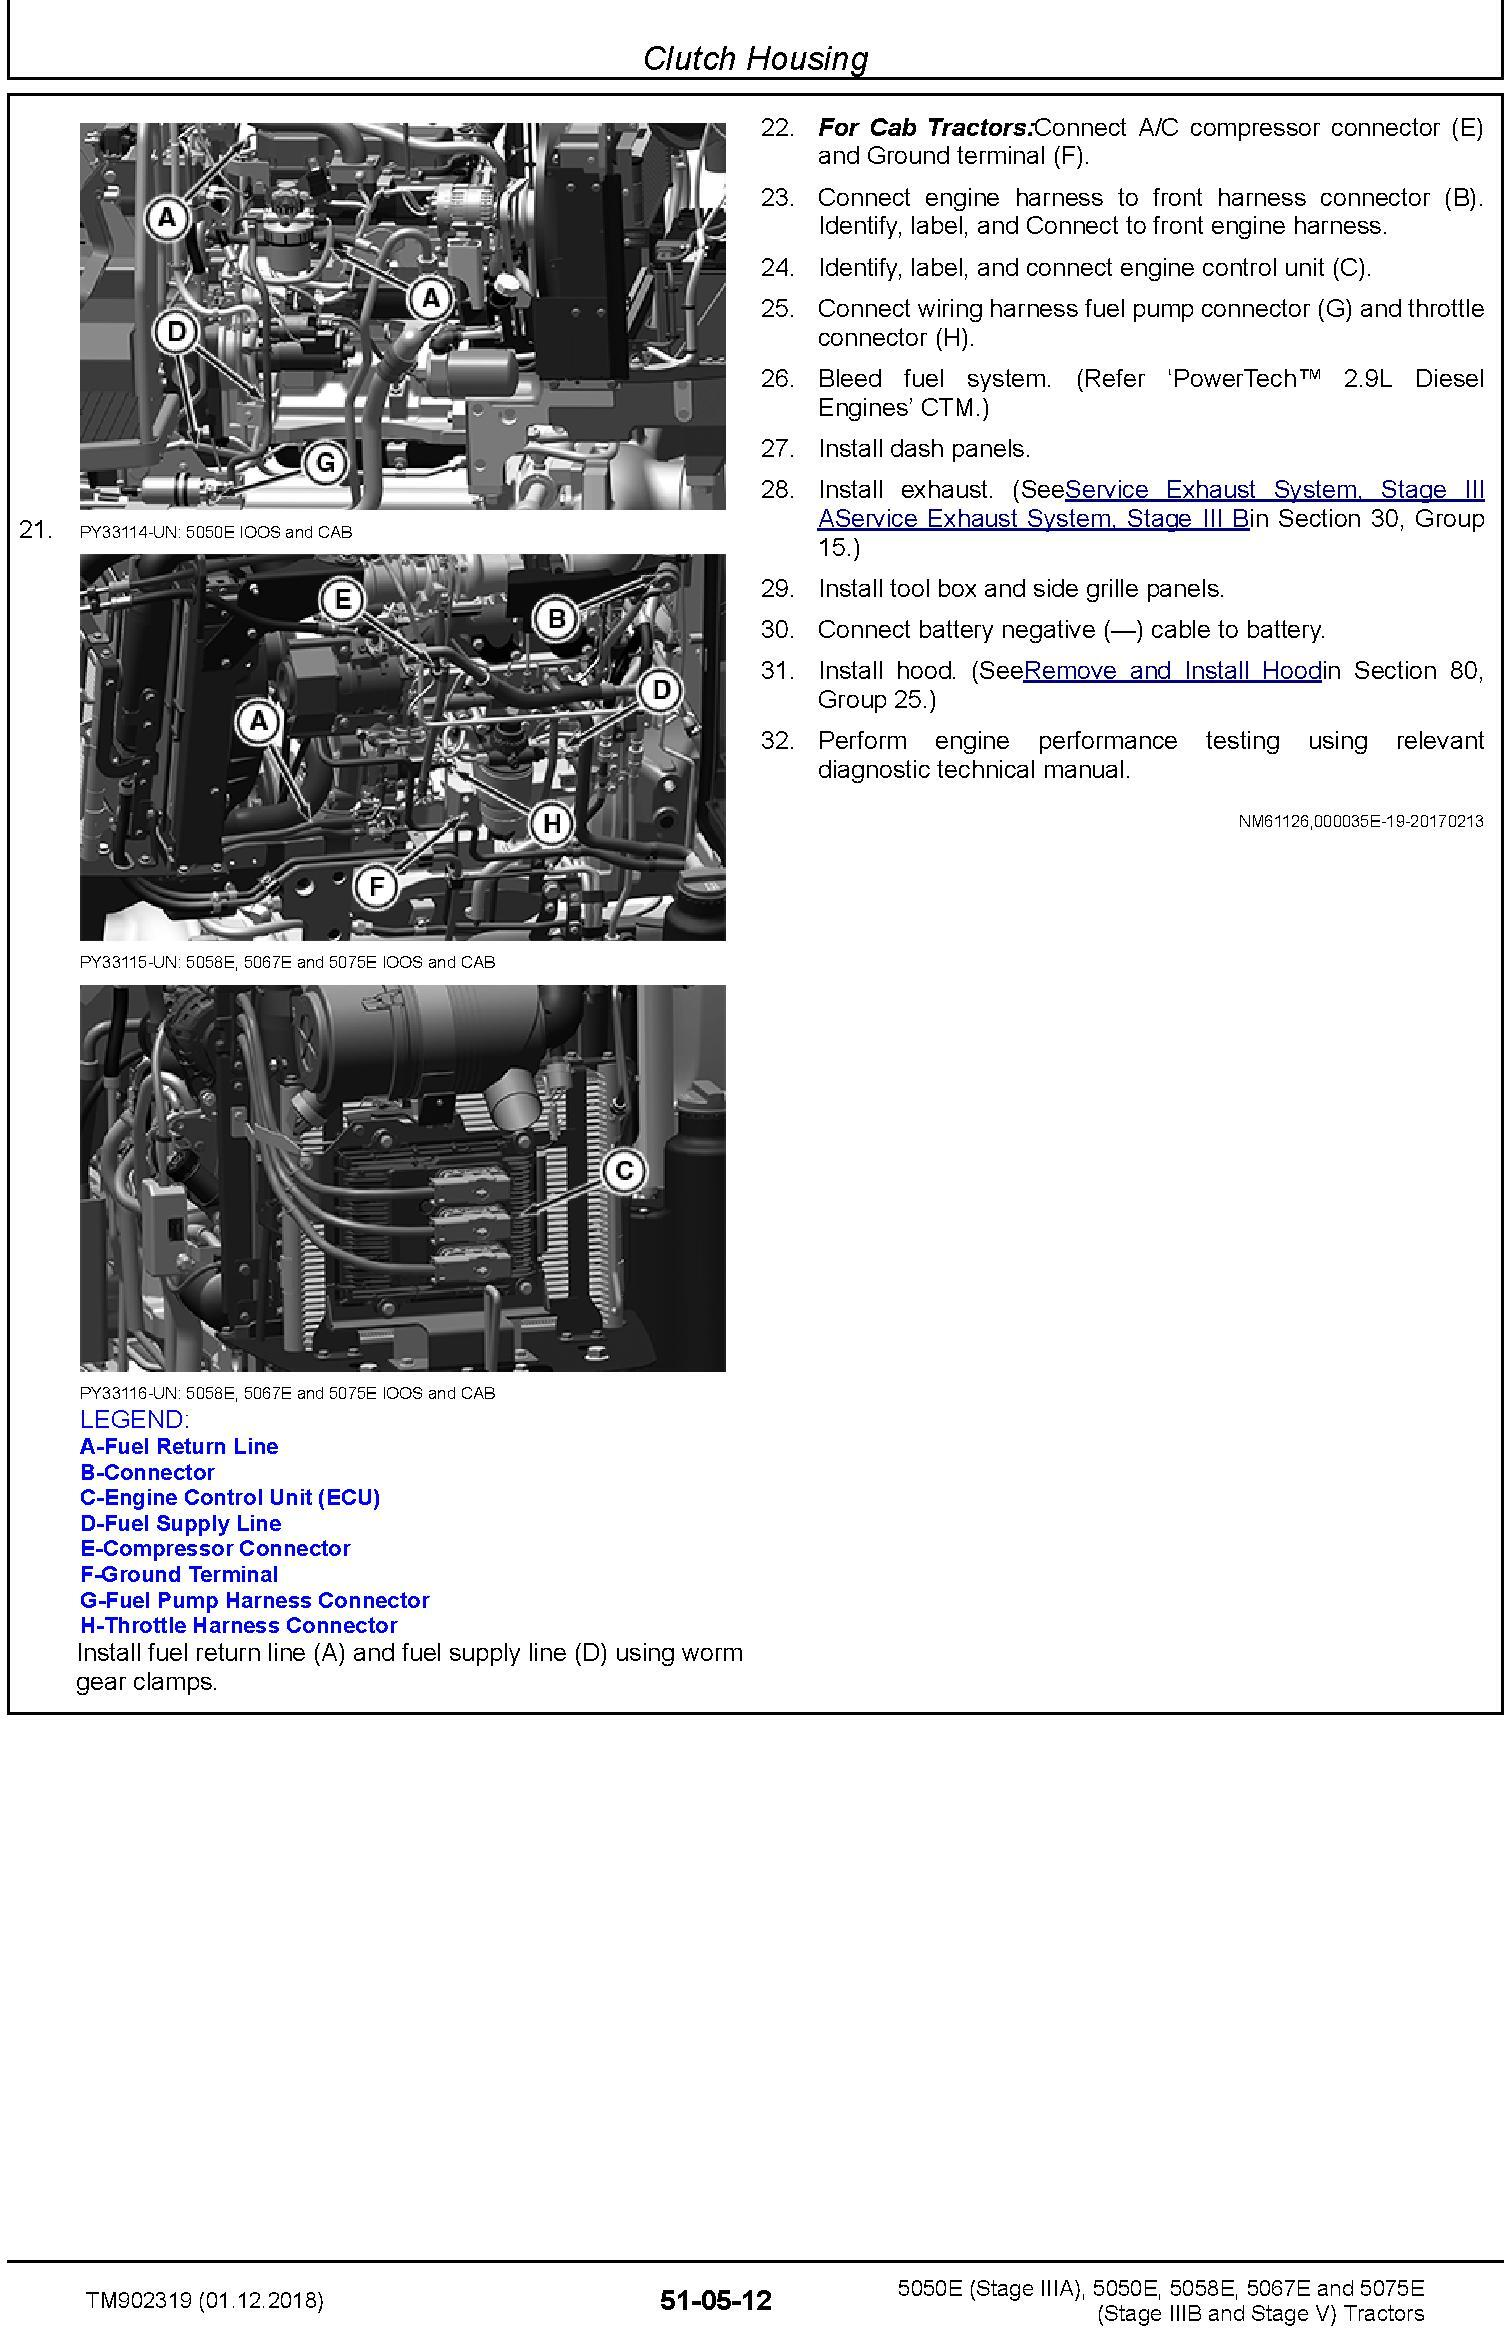 John Deere 5050E, 5050E, 5058E, 5067E, 5075E Tractors Service Repair Technical Manual (TM902319) - 1